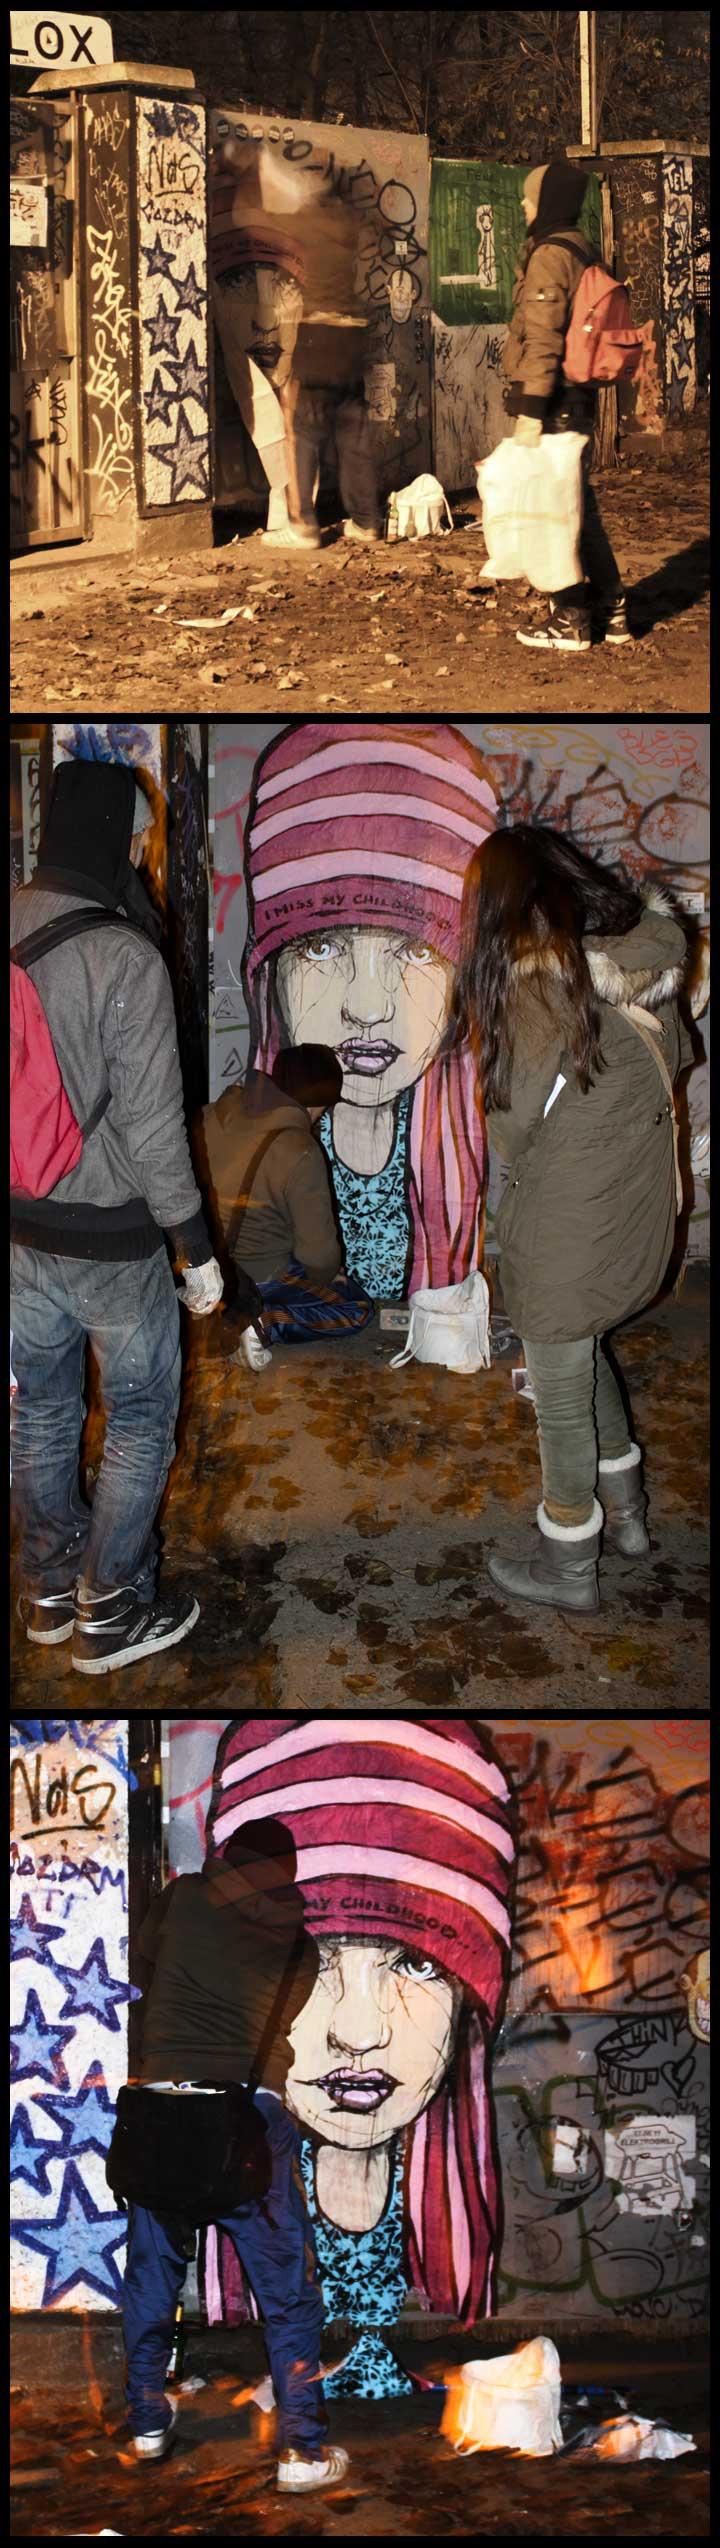 El Bocho Berlin Streetart104